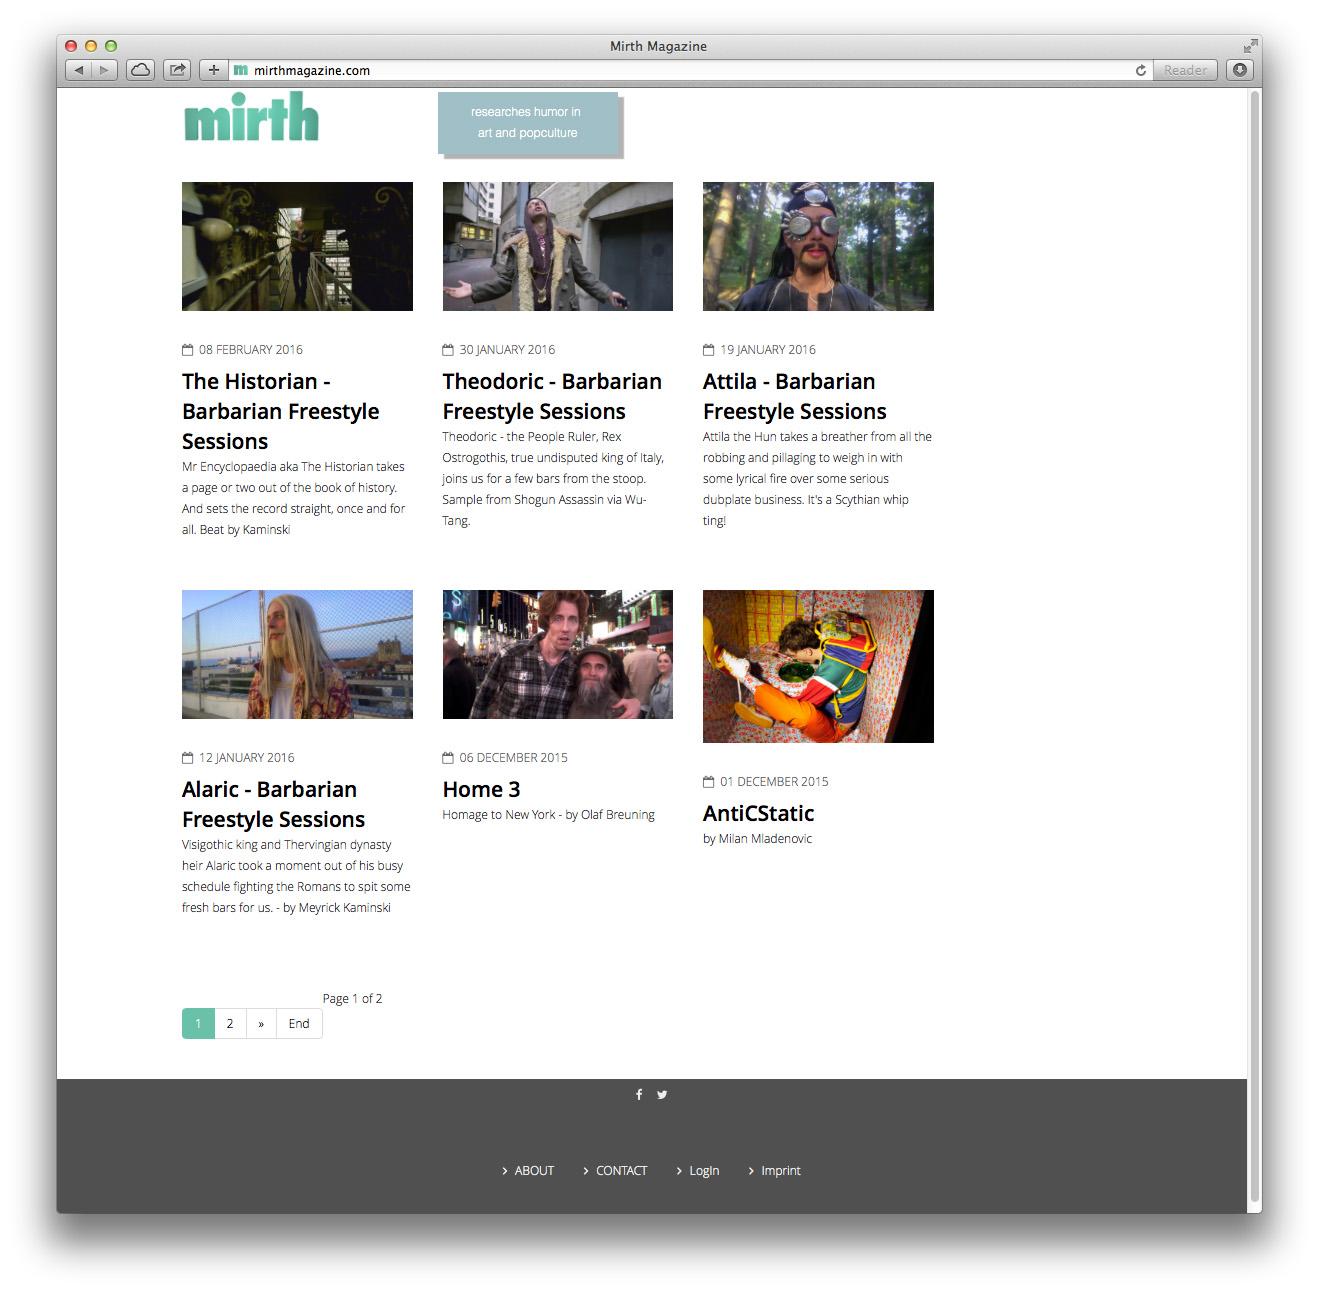 Mirth Magazine